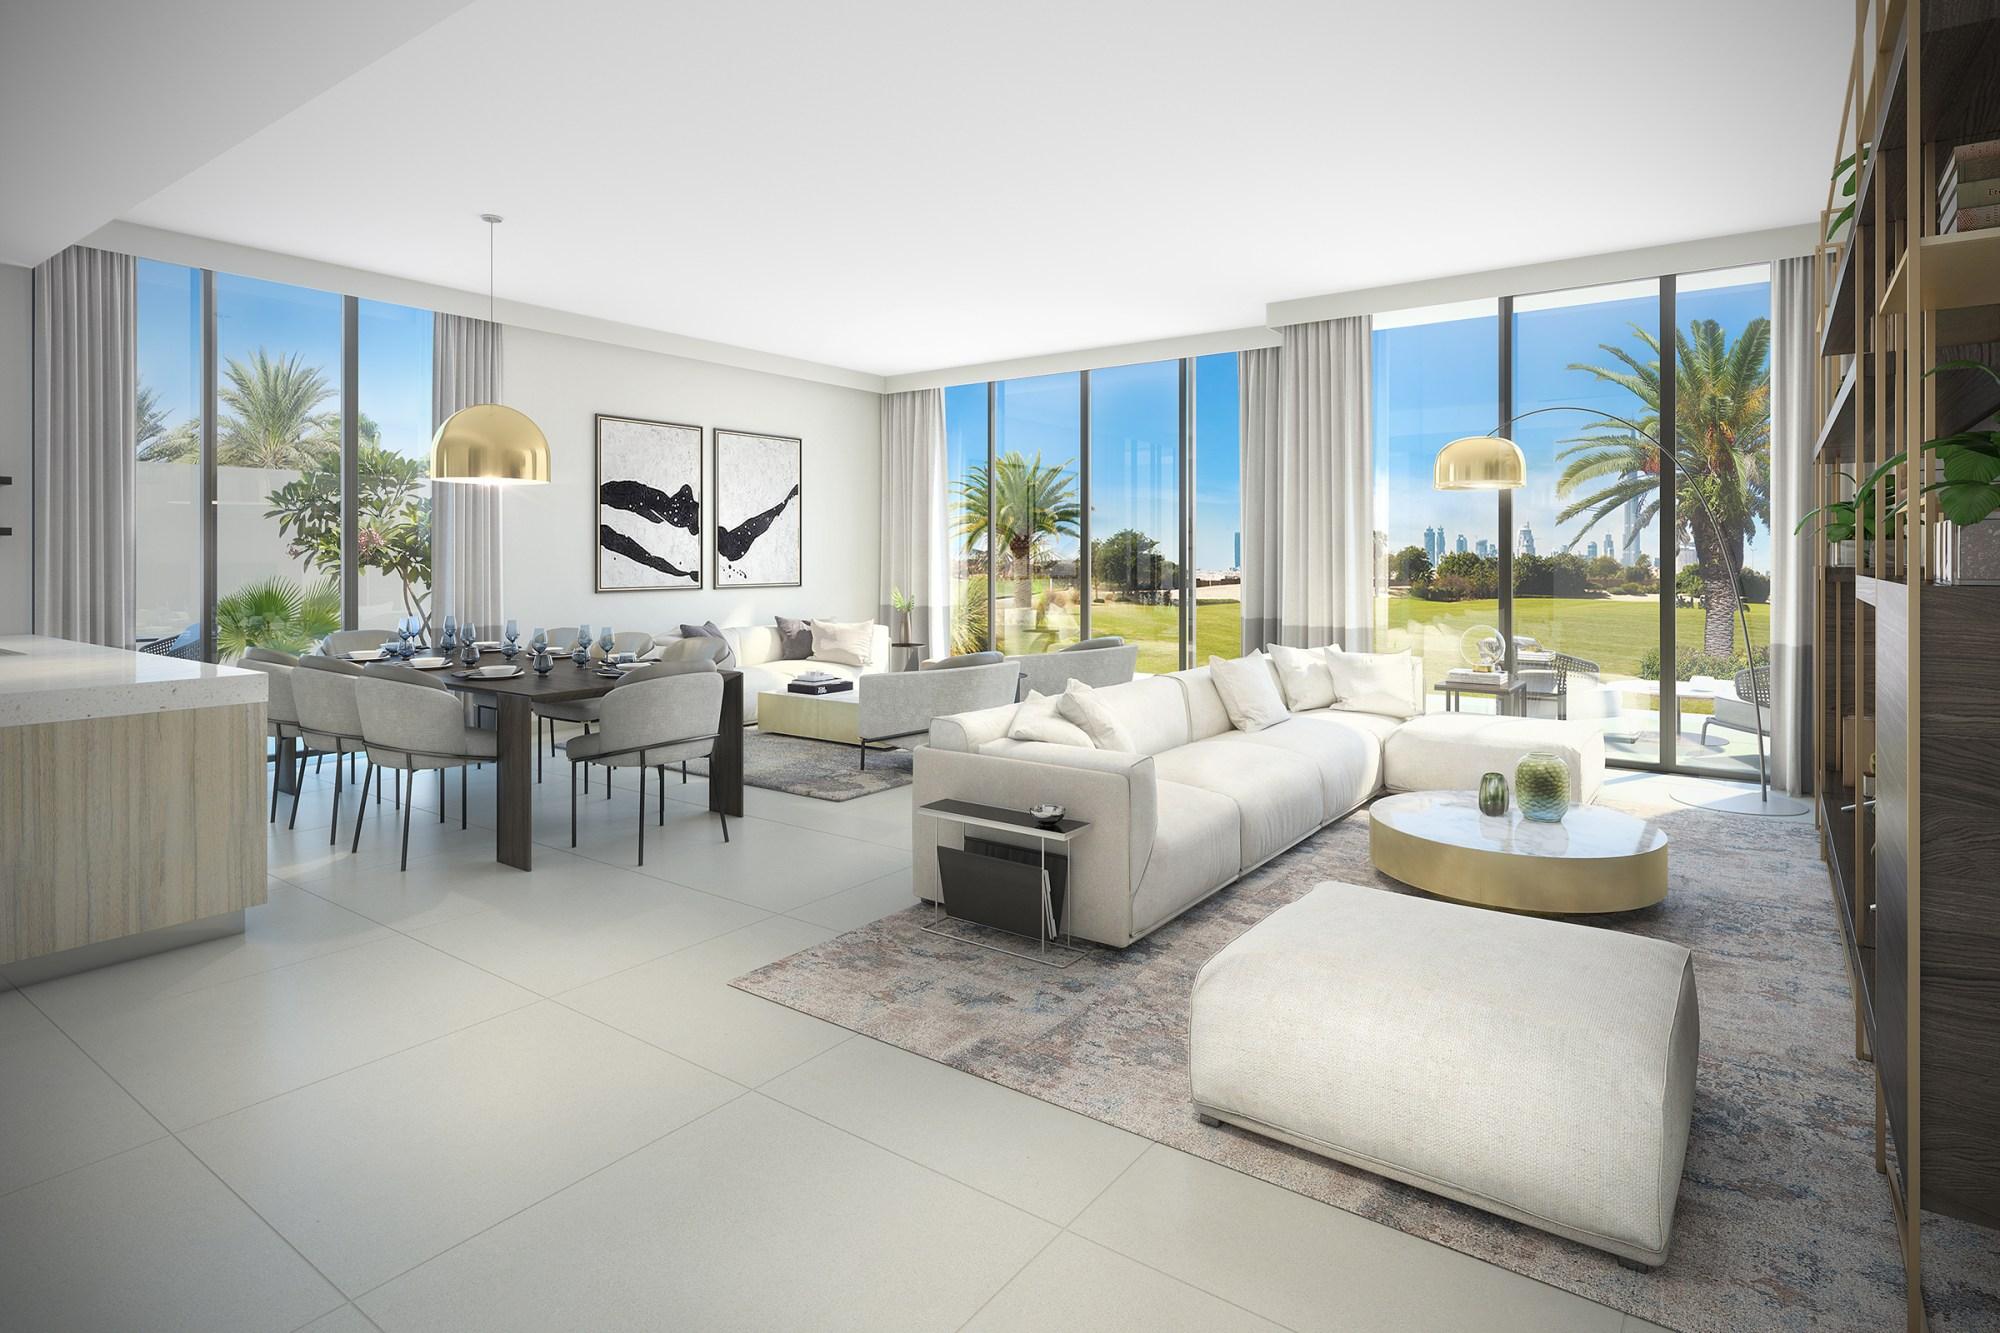 3 Bedroom Villa Set Amongst The Golf Course